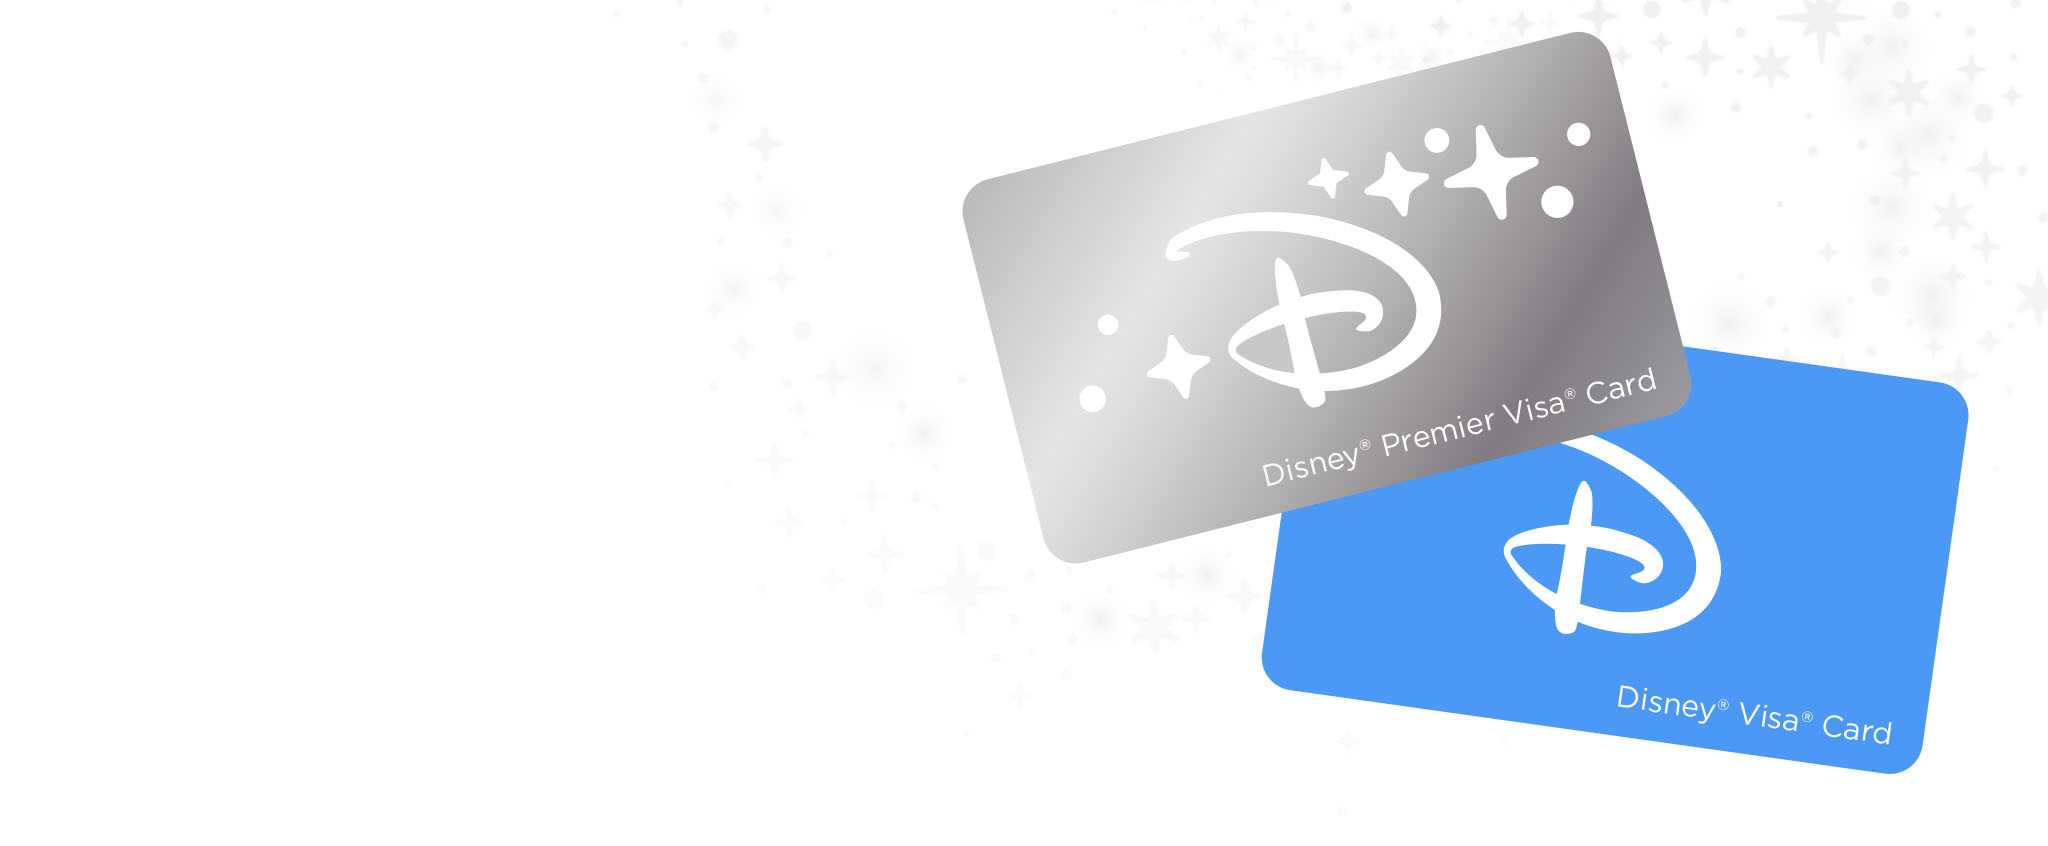 Compare Disney Credit Cards: Disney Premier & Disney Visa